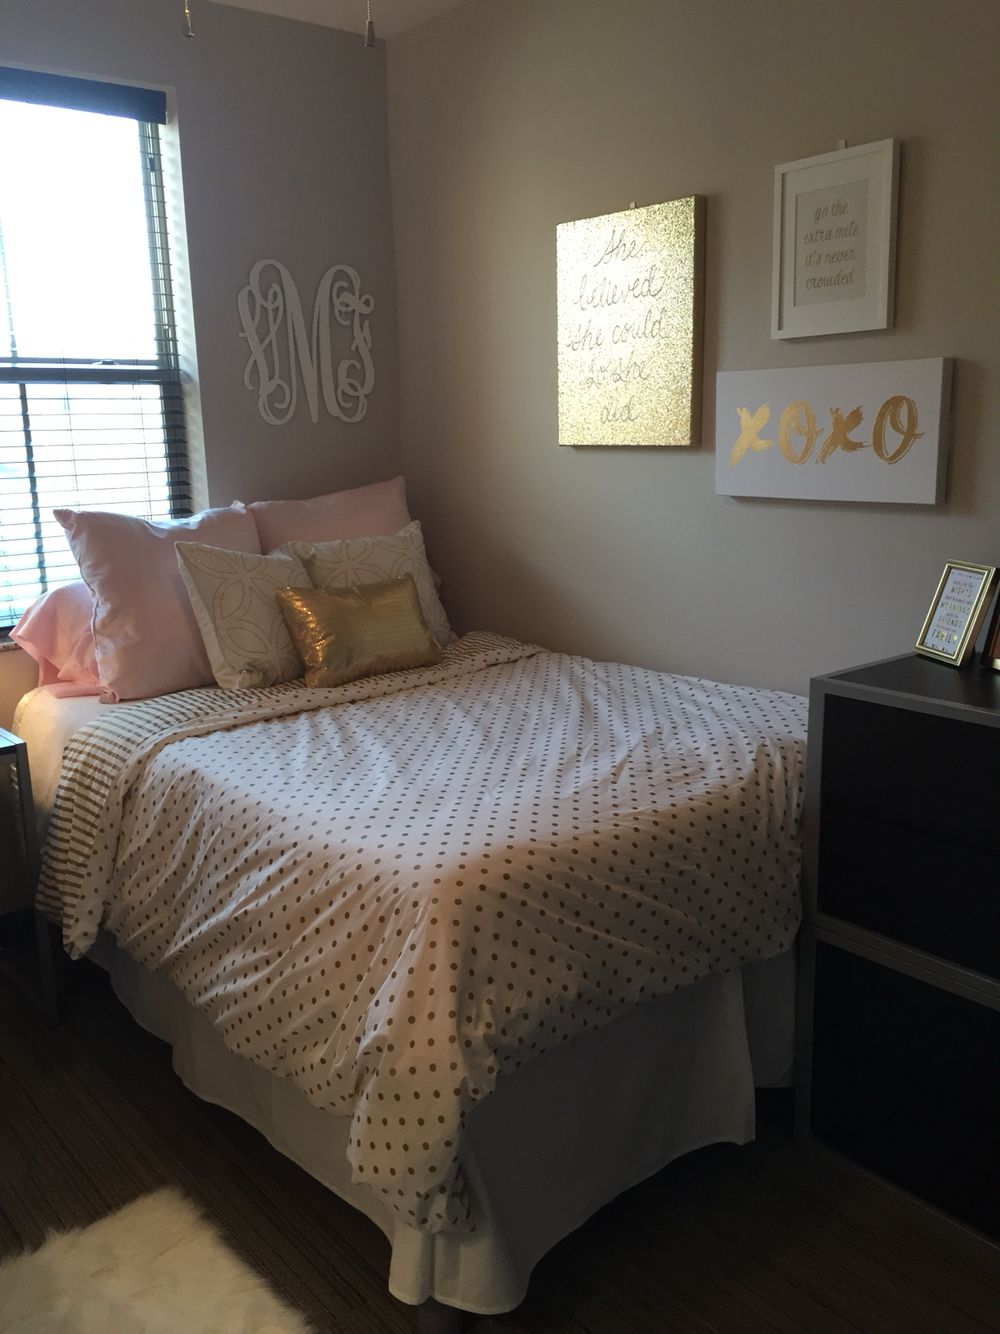 Attractive University Of Kentucky Dorm Room With PBteen Sheets! Part 18